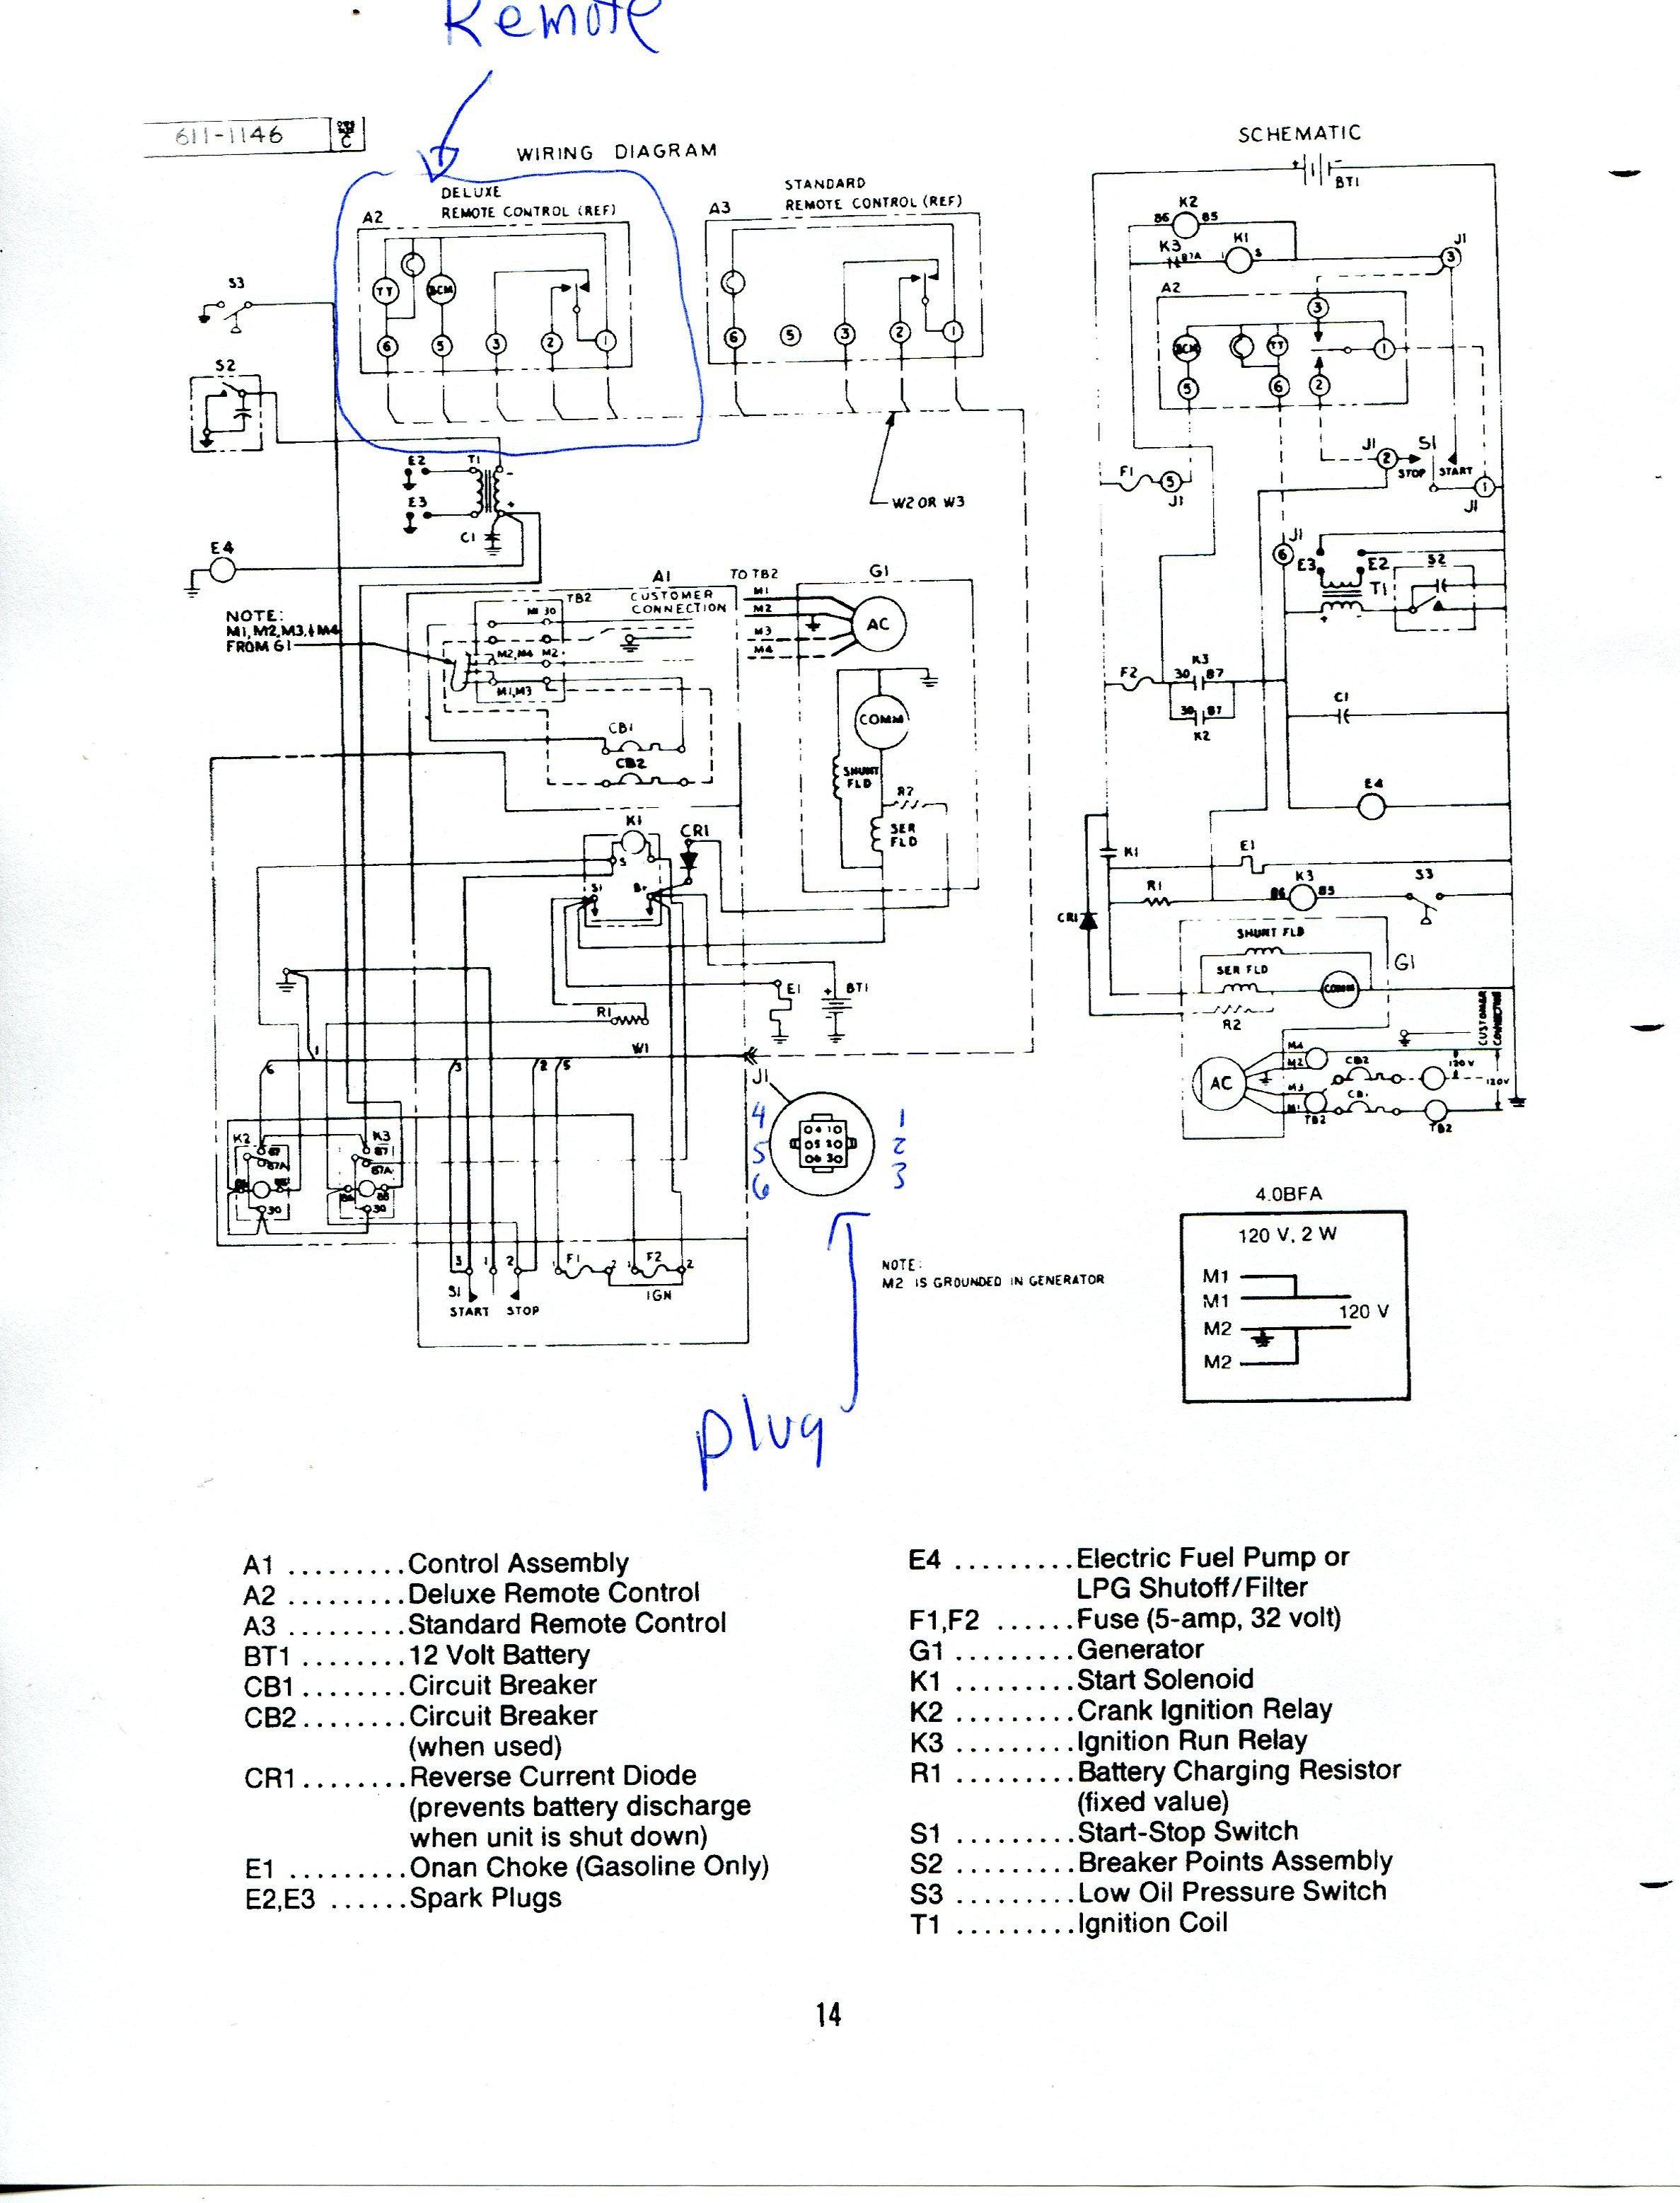 DIAGRAM] Onan Generator Wiring Diagram 4000 FULL Version HD Quality Diagram  4000 - EIGHTDIAGRAMCITY.BELLEILMERSION.FReightdiagramcity.belleilmersion.fr